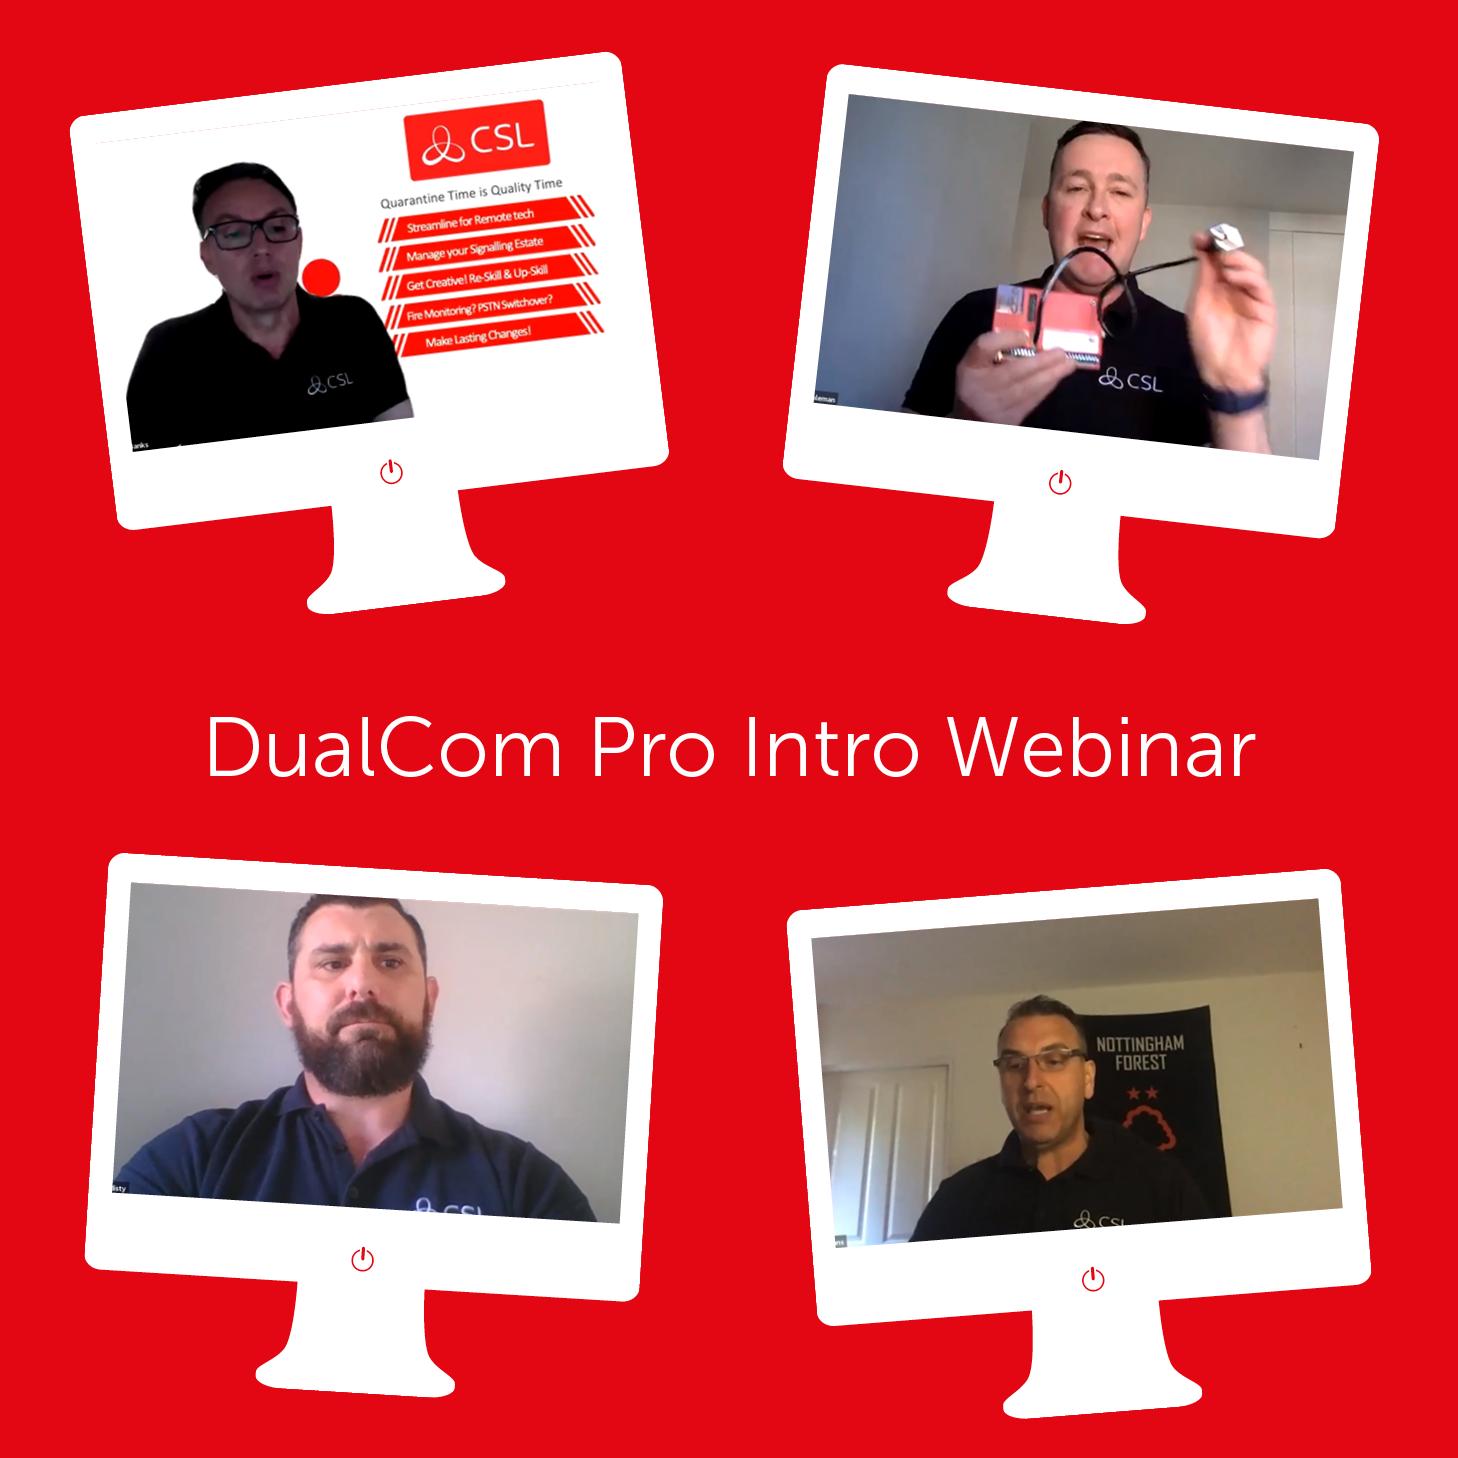 CSL Webinar – DualCom Pro Introduction